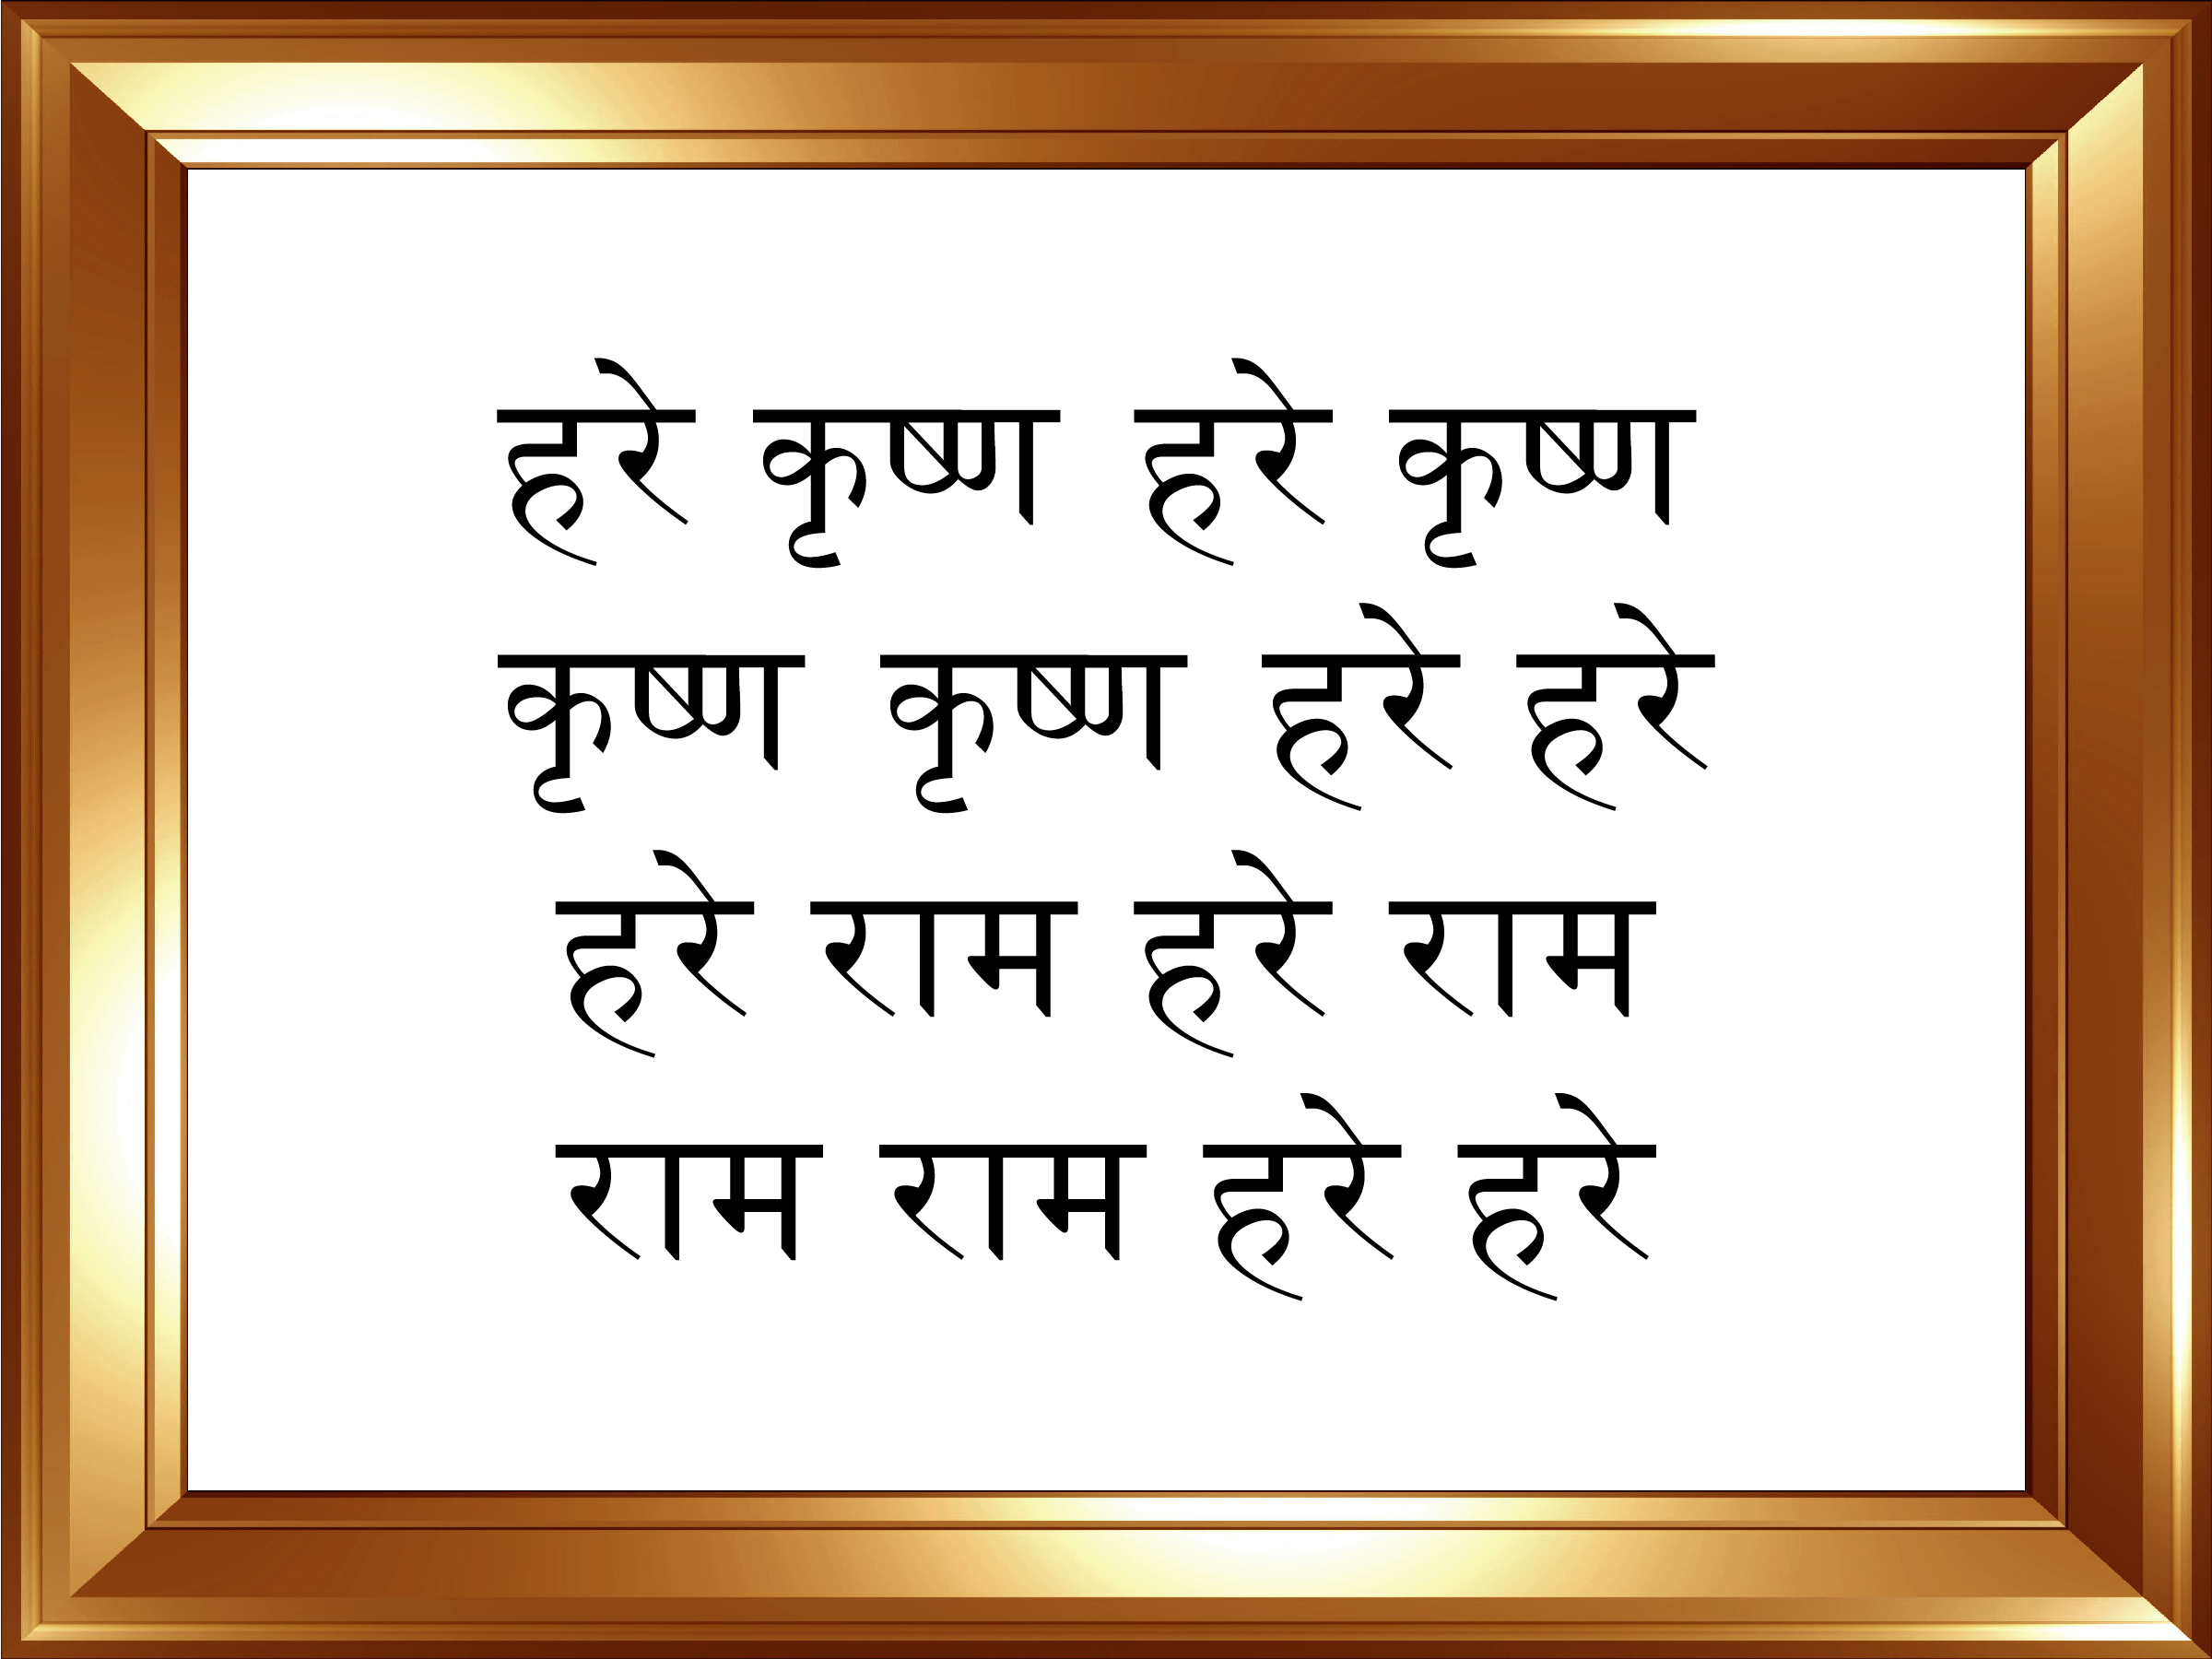 File:Maha-mantra.png - Wikipedia